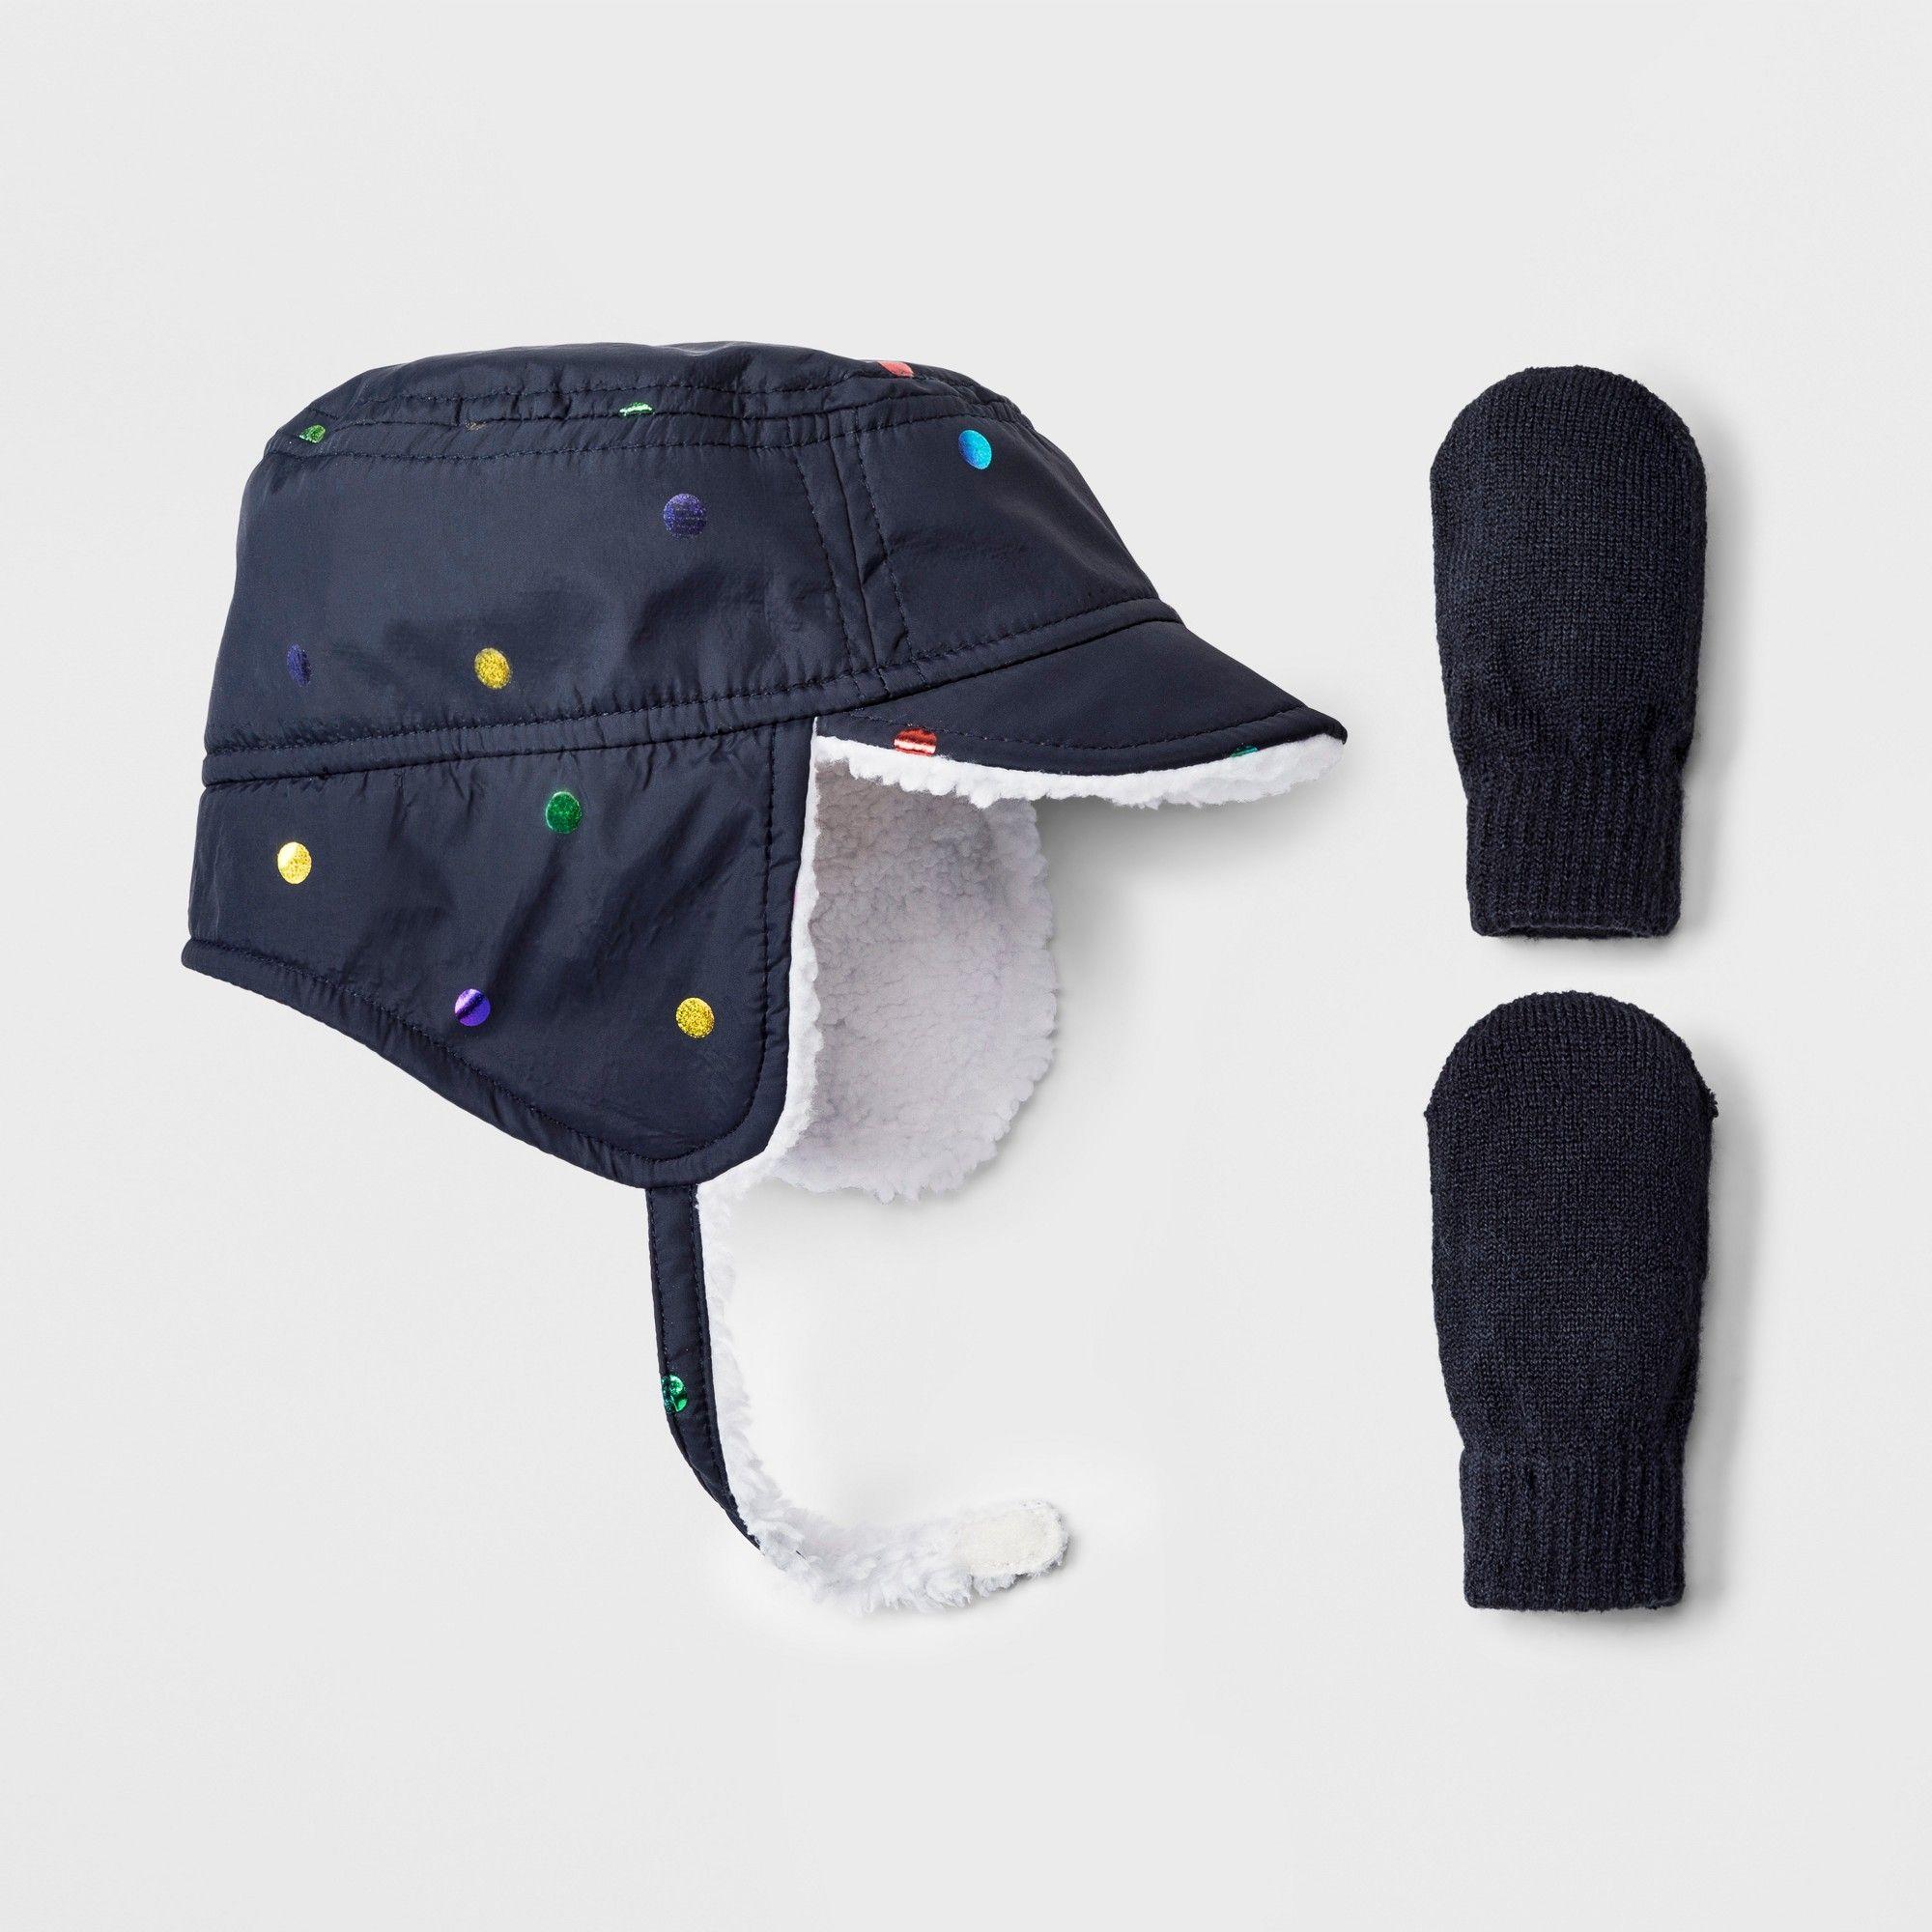 251cc52ec82 Toddler Girls  Rainbow Dot Trapper Hat and Mitten Set - Cat   Jack Blue  12-24M